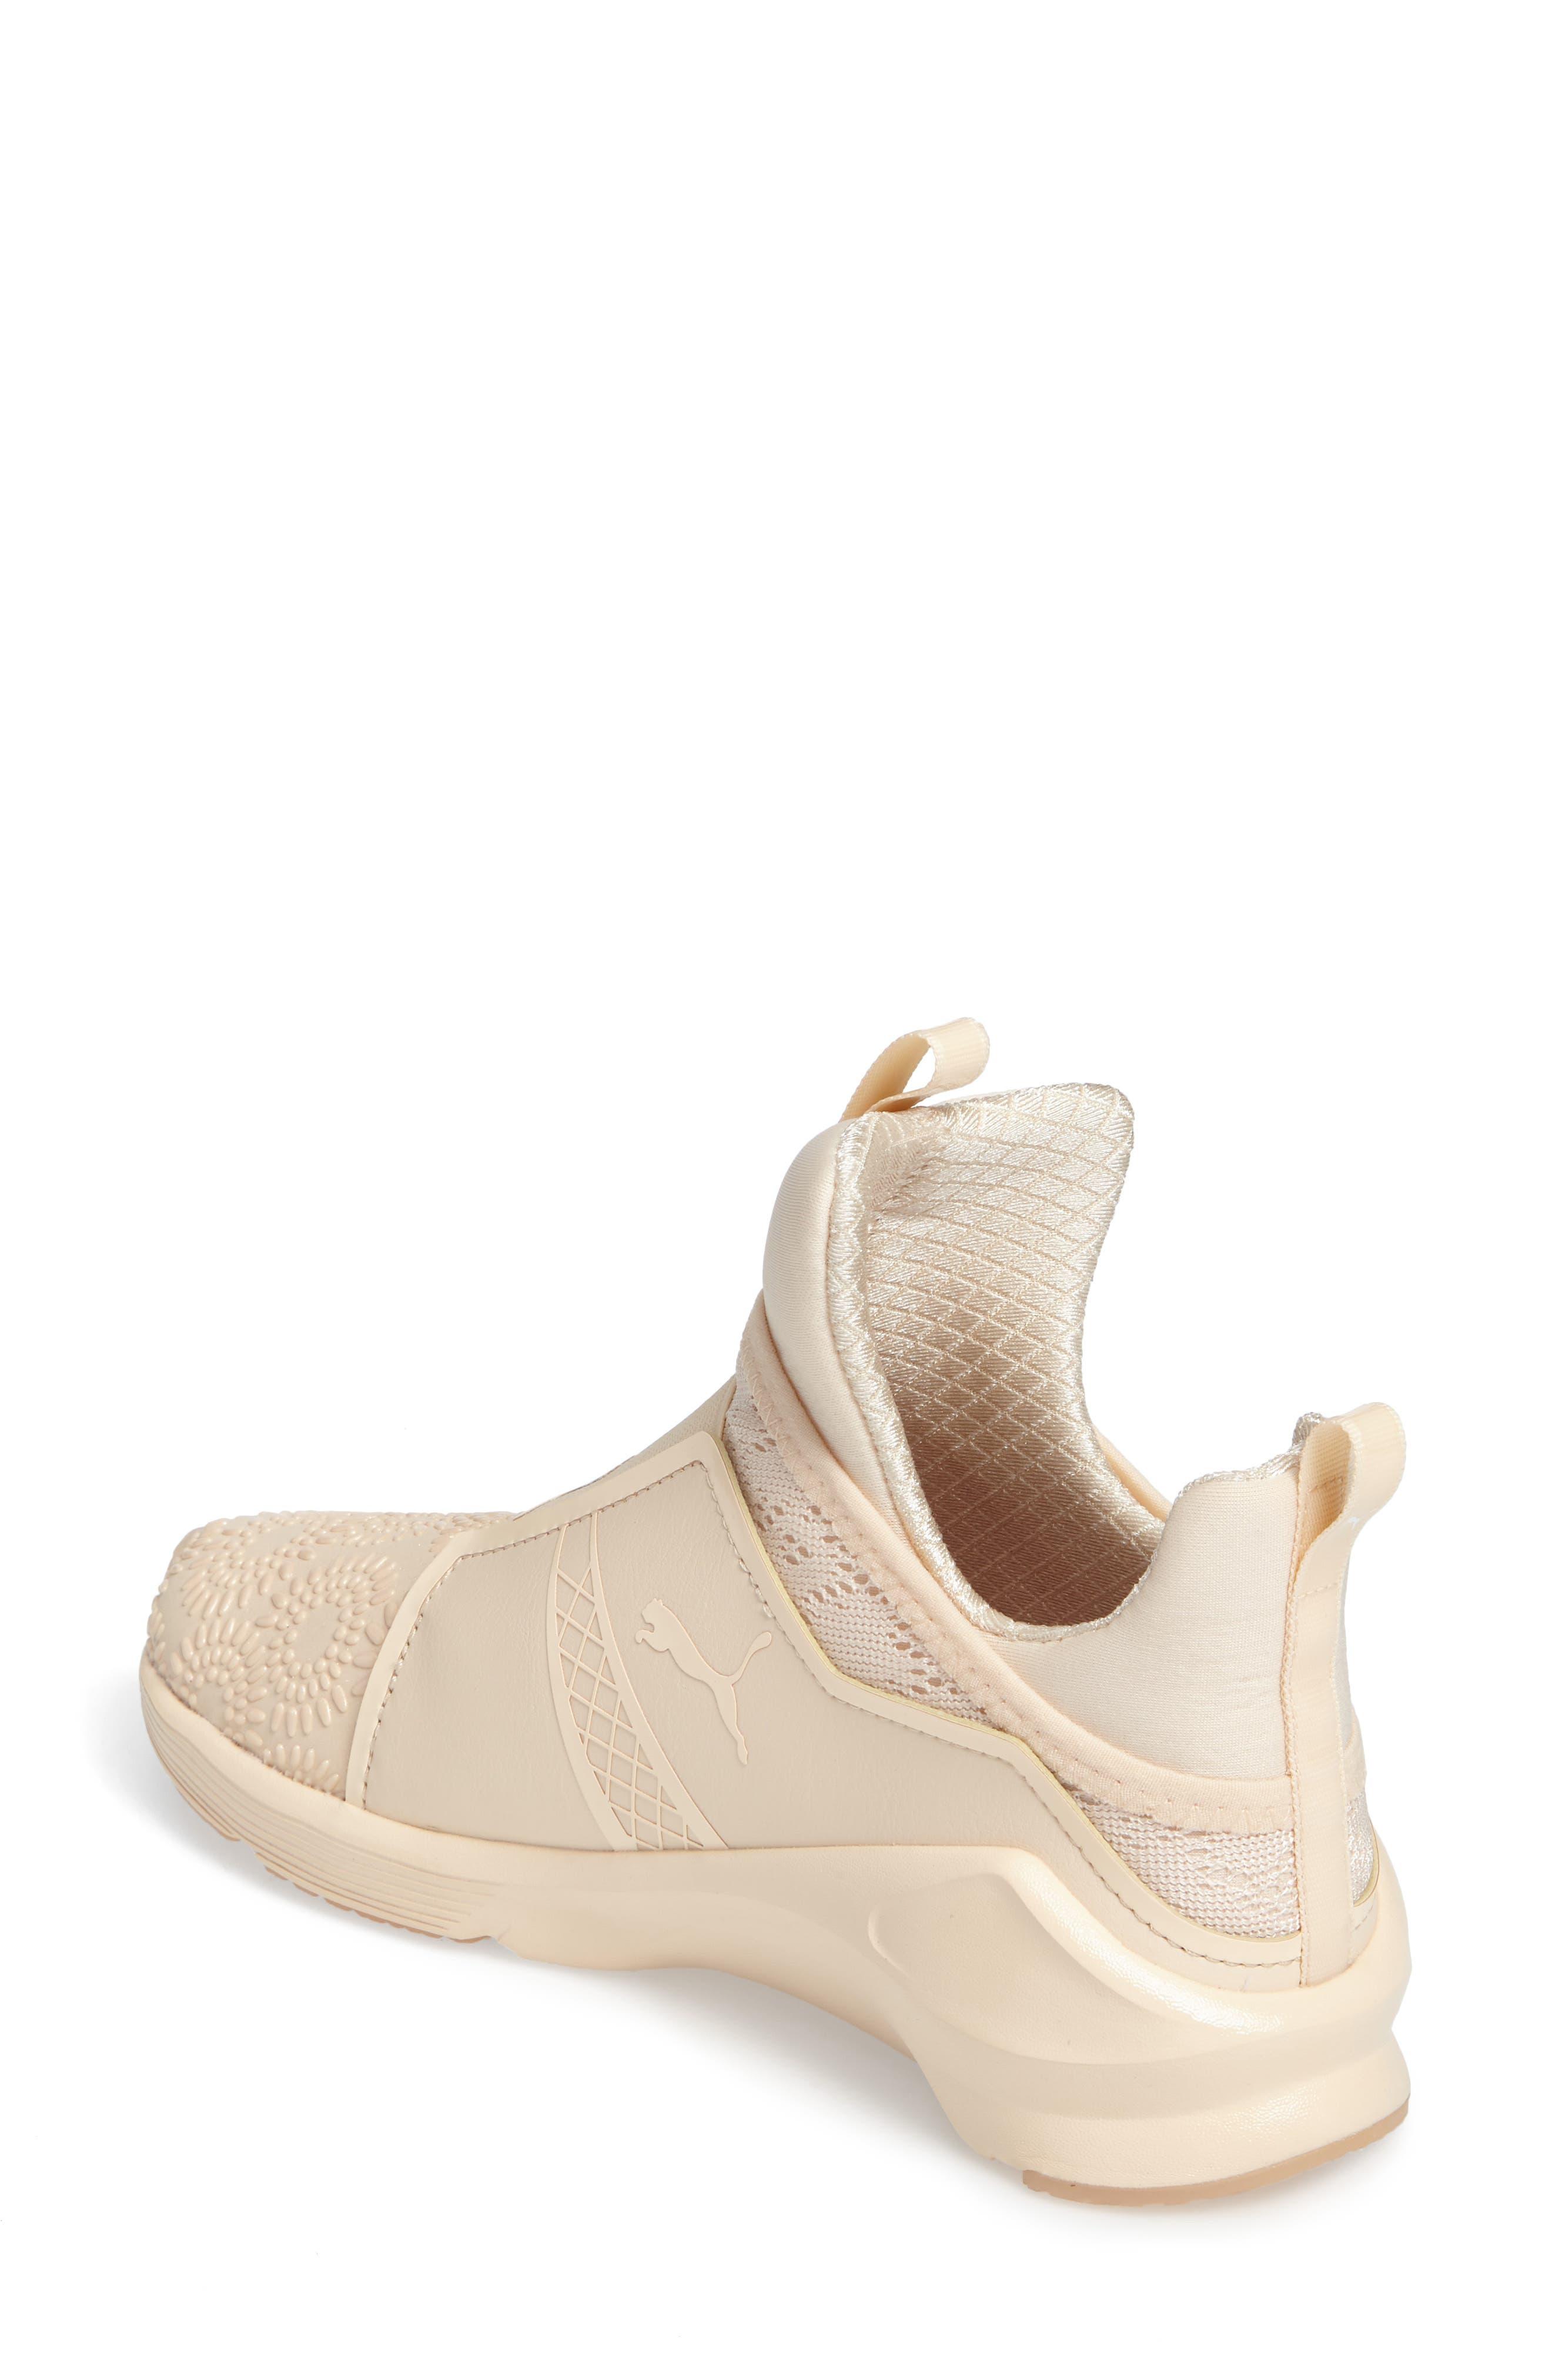 Fierce KRM High Top Sneaker,                             Alternate thumbnail 5, color,